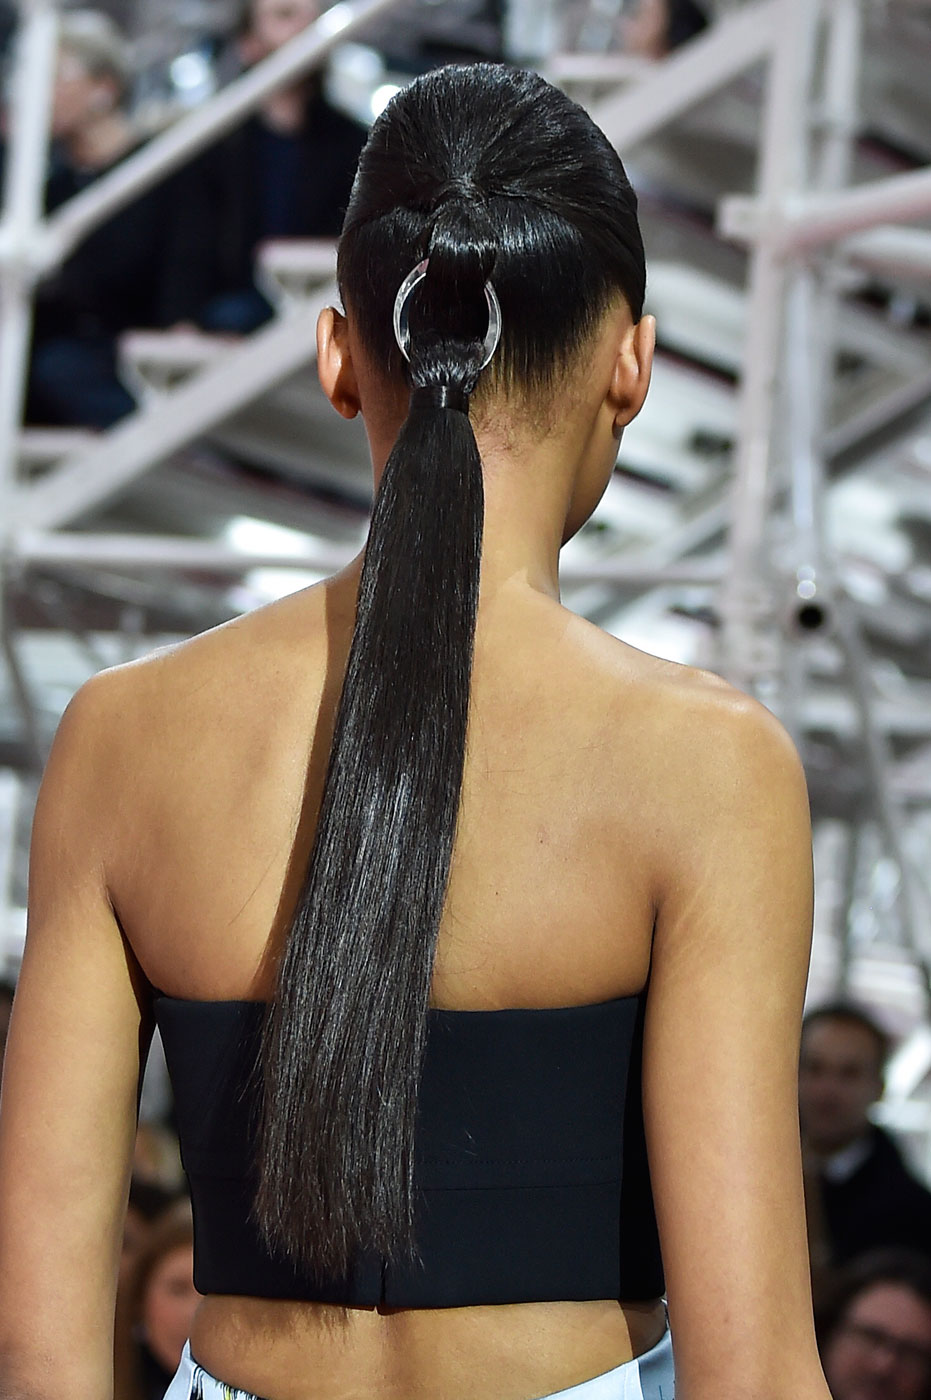 Christian-Dior-fashion-runway-show-close-ups-haute-couture-paris-spring-summer-2015-the-impression-027